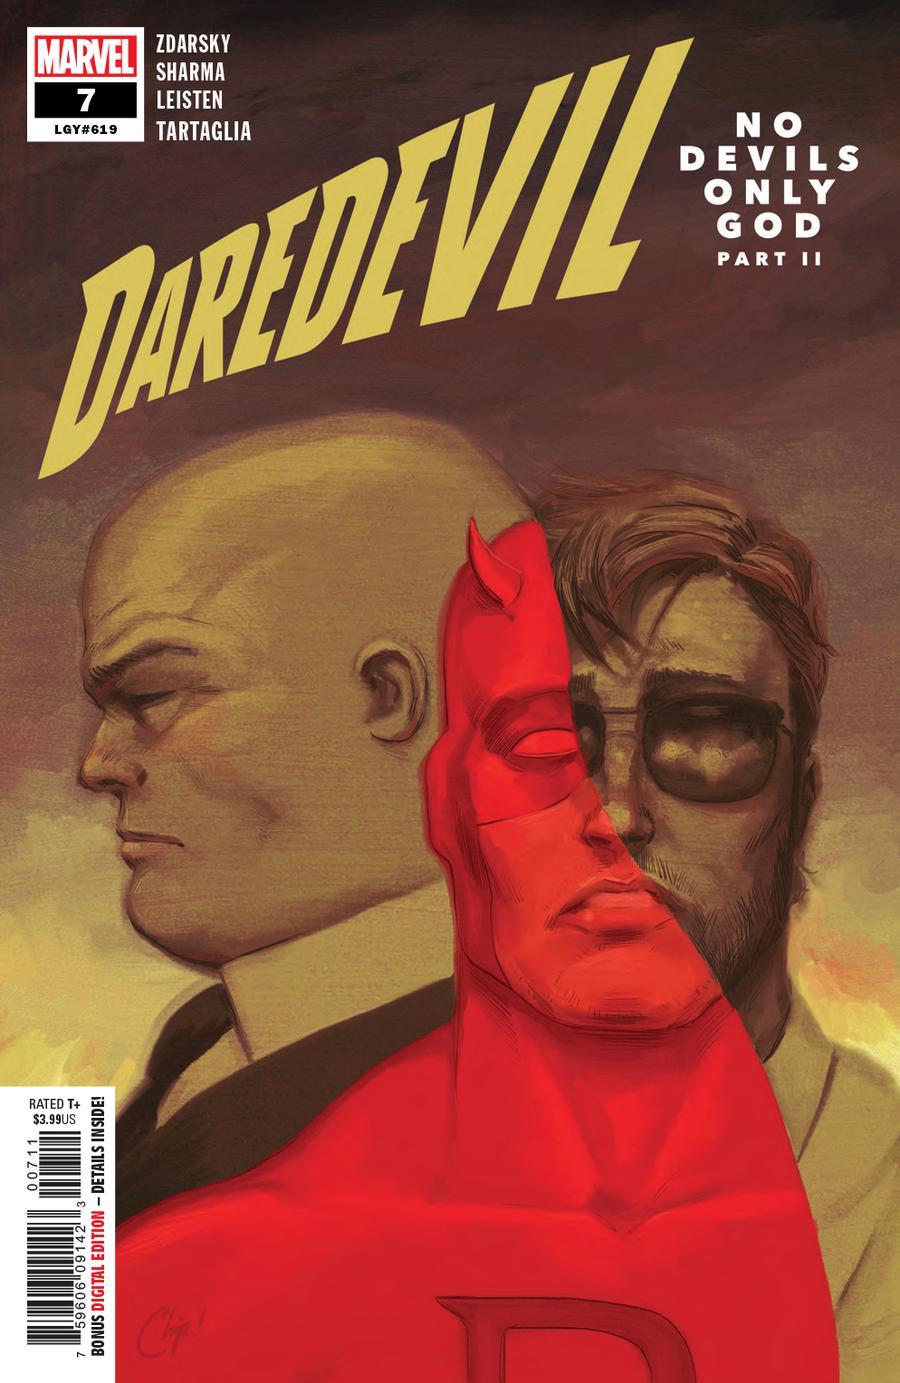 Daredevil Vol 6 #7 Cover A 1st Ptg Regular Chip Zdarsky Cover